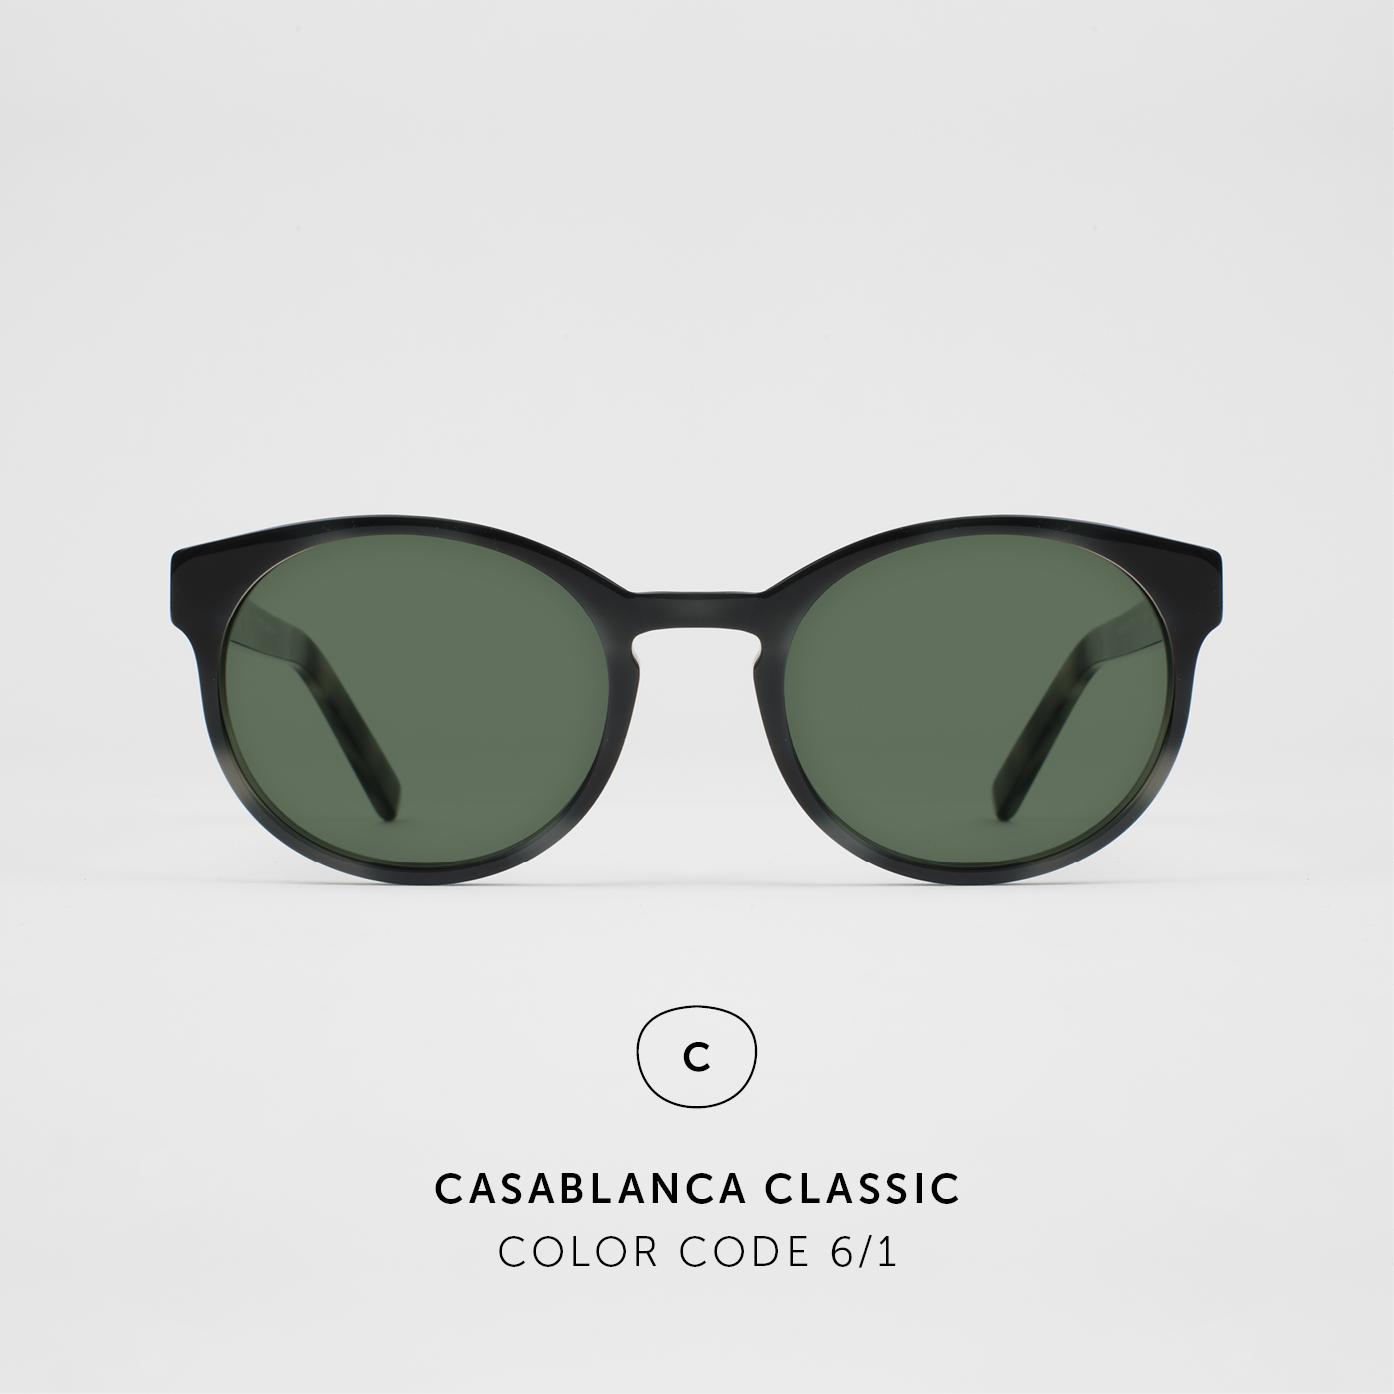 CasablancaClassic28.jpg